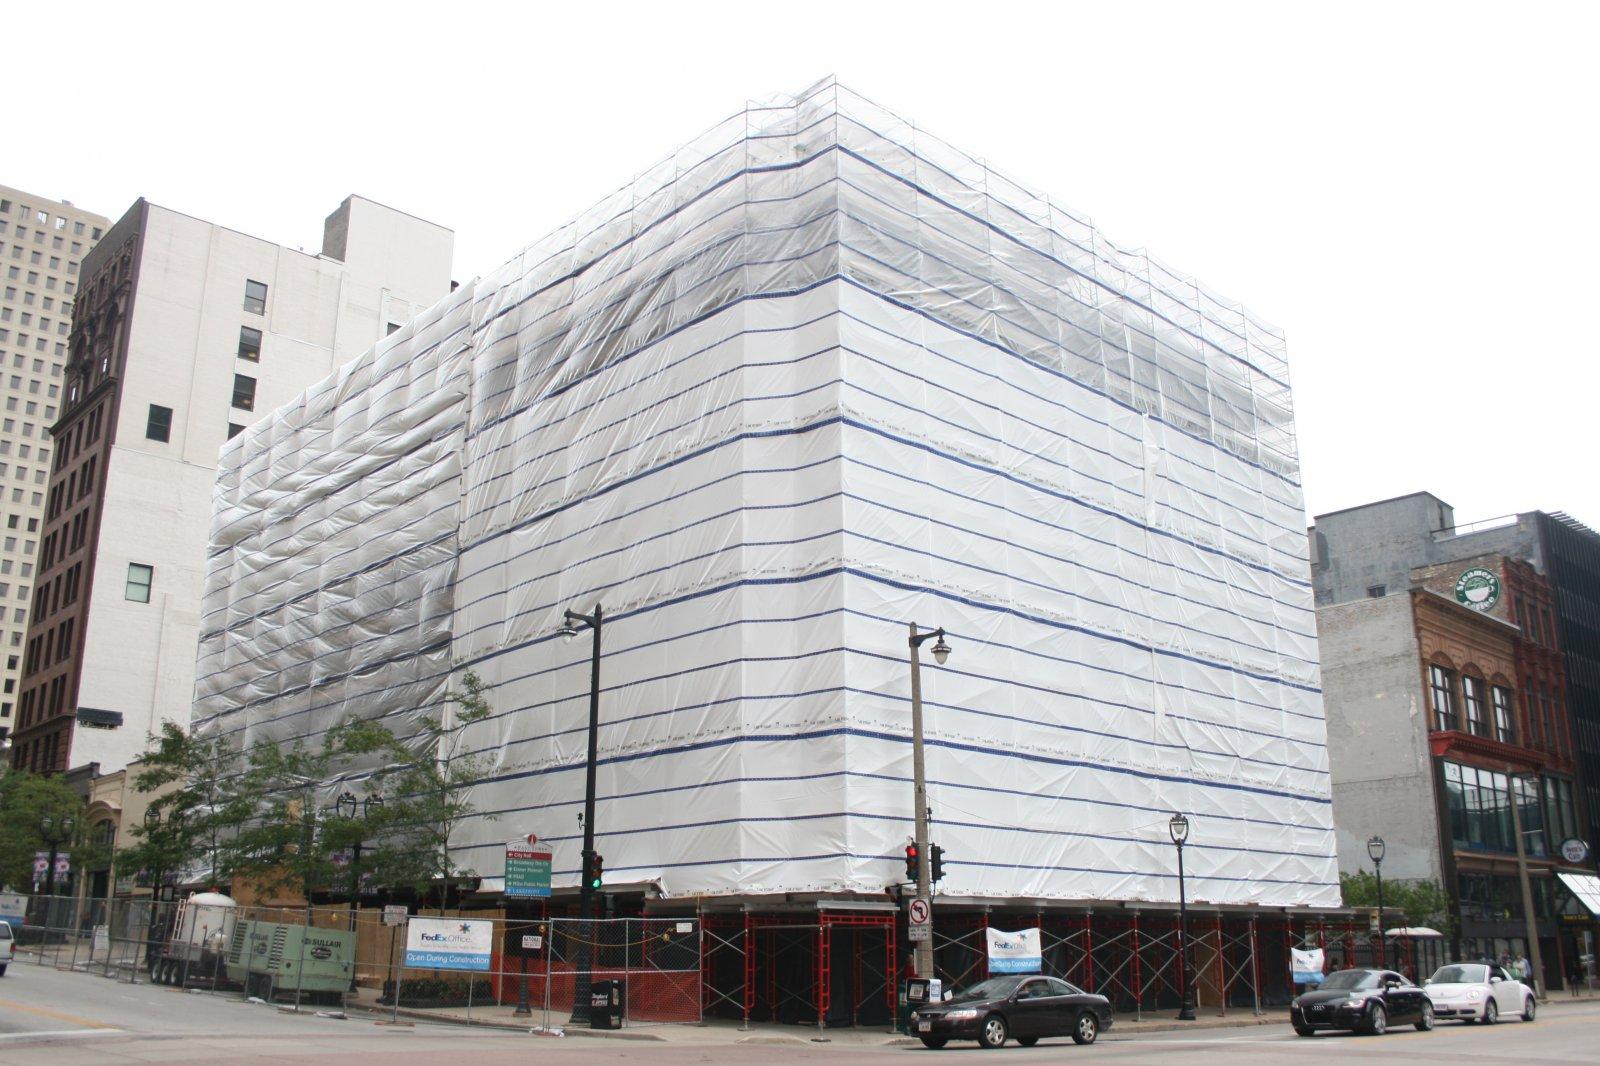 Plastic Wrapped Iron Block Building